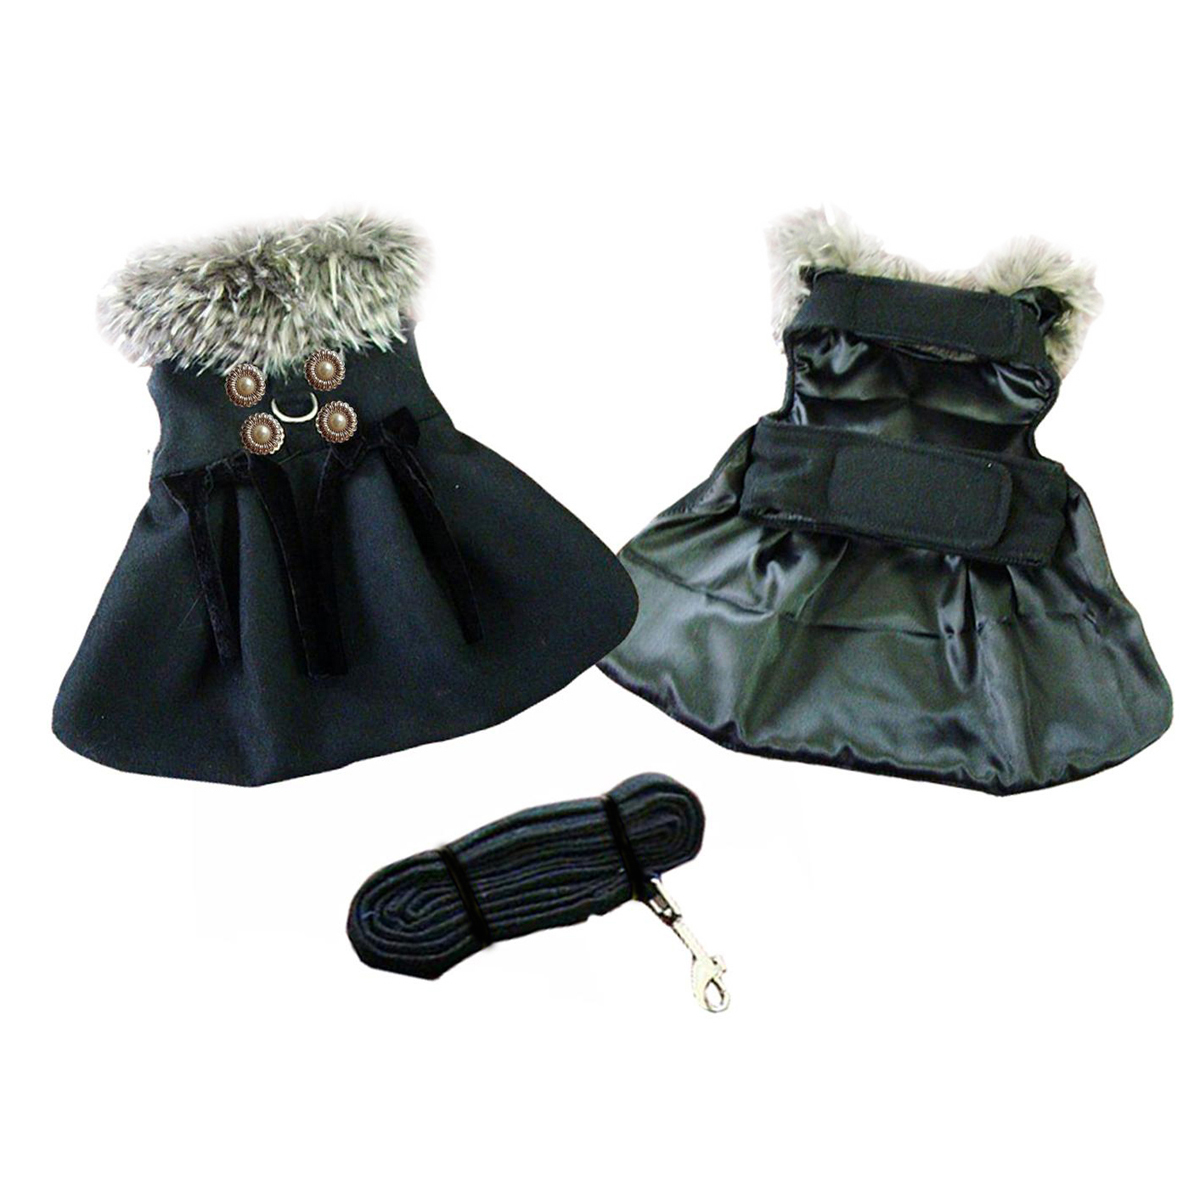 Classic Black Wool Dog Harness Coat by Doggie Design